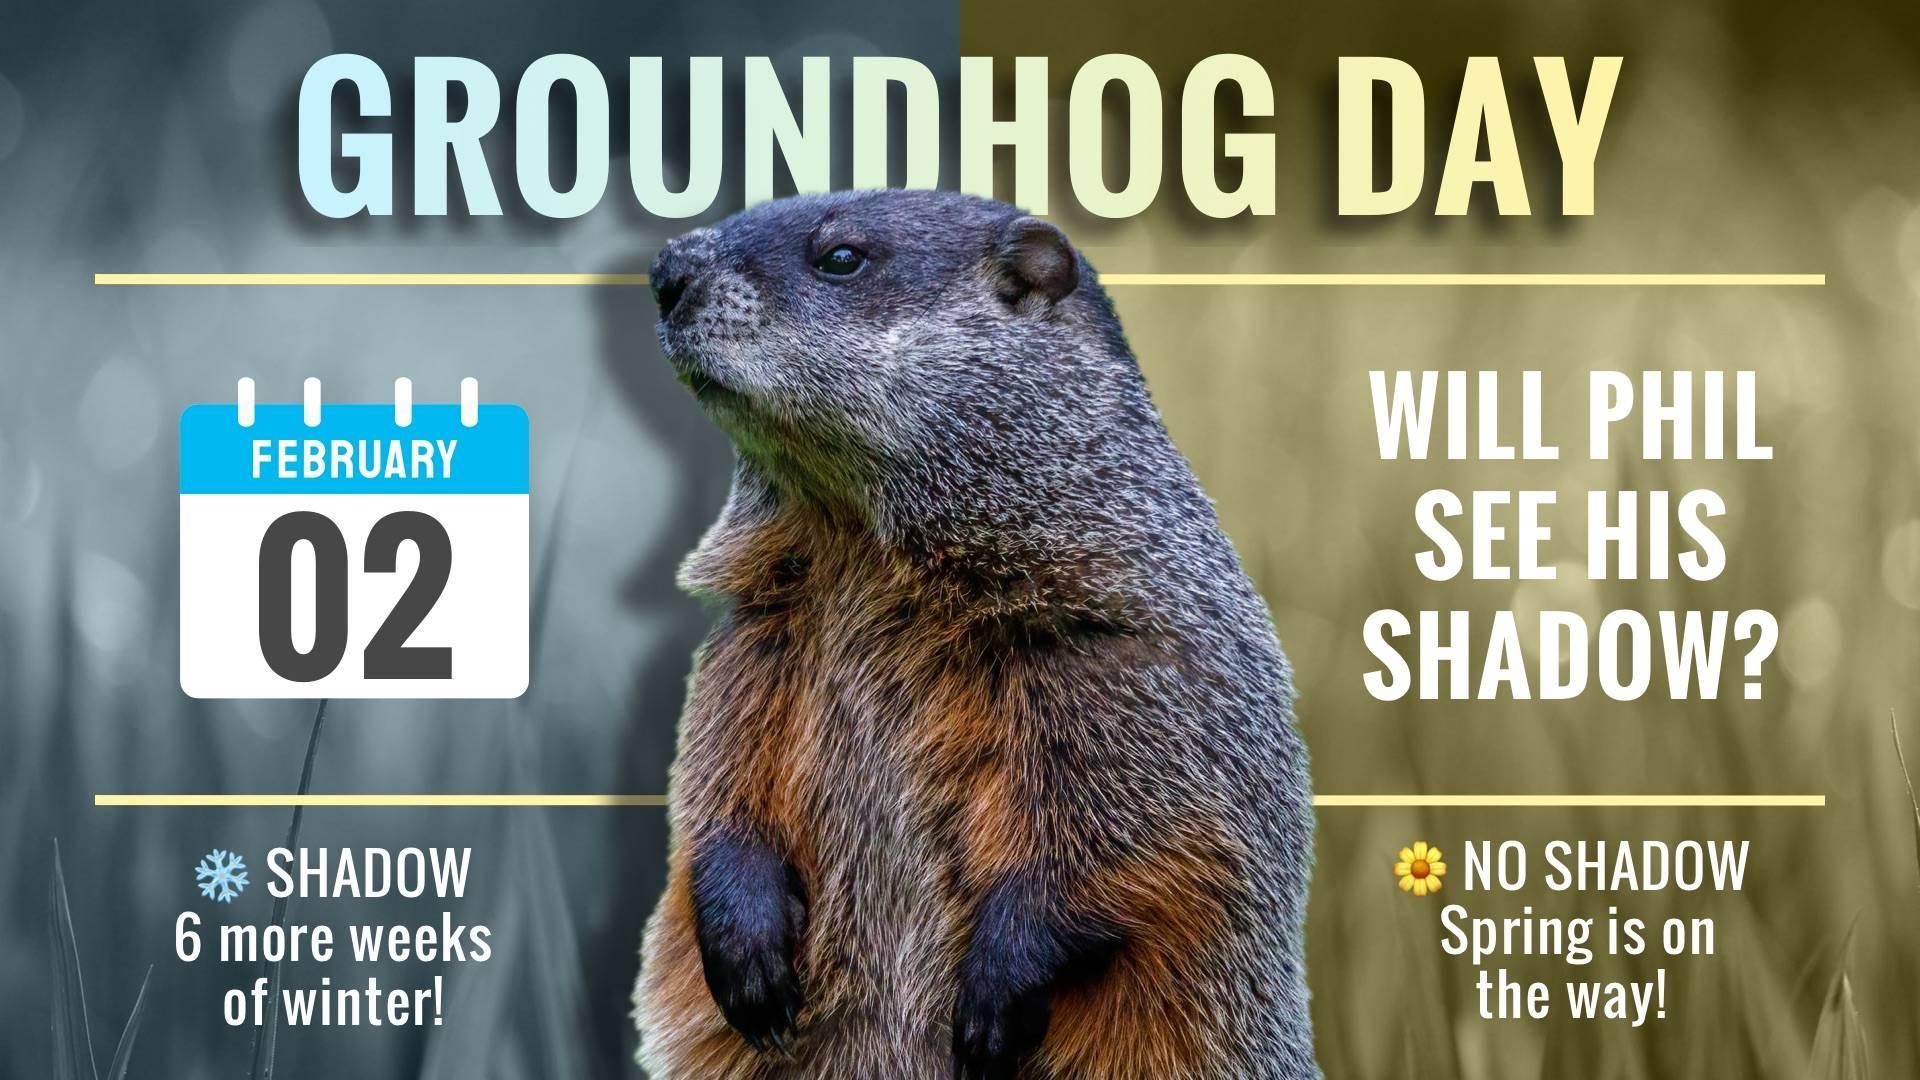 Groundhog Day Digital Signage Template